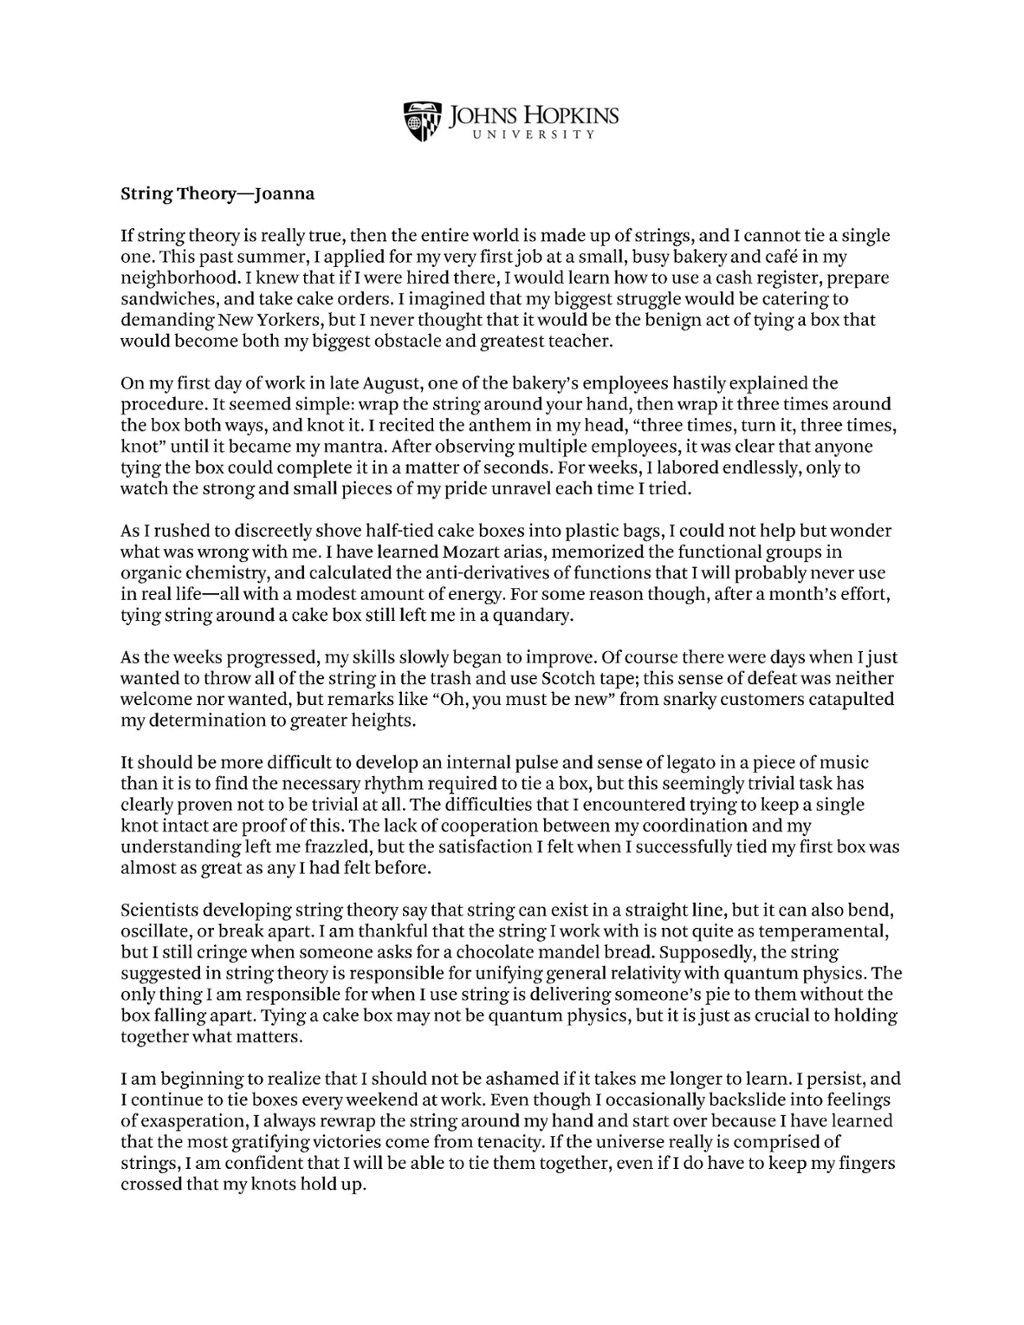 001 Essay Example John Hopkins Essays That Singular Worked Johns 2021 2018 2020 Large